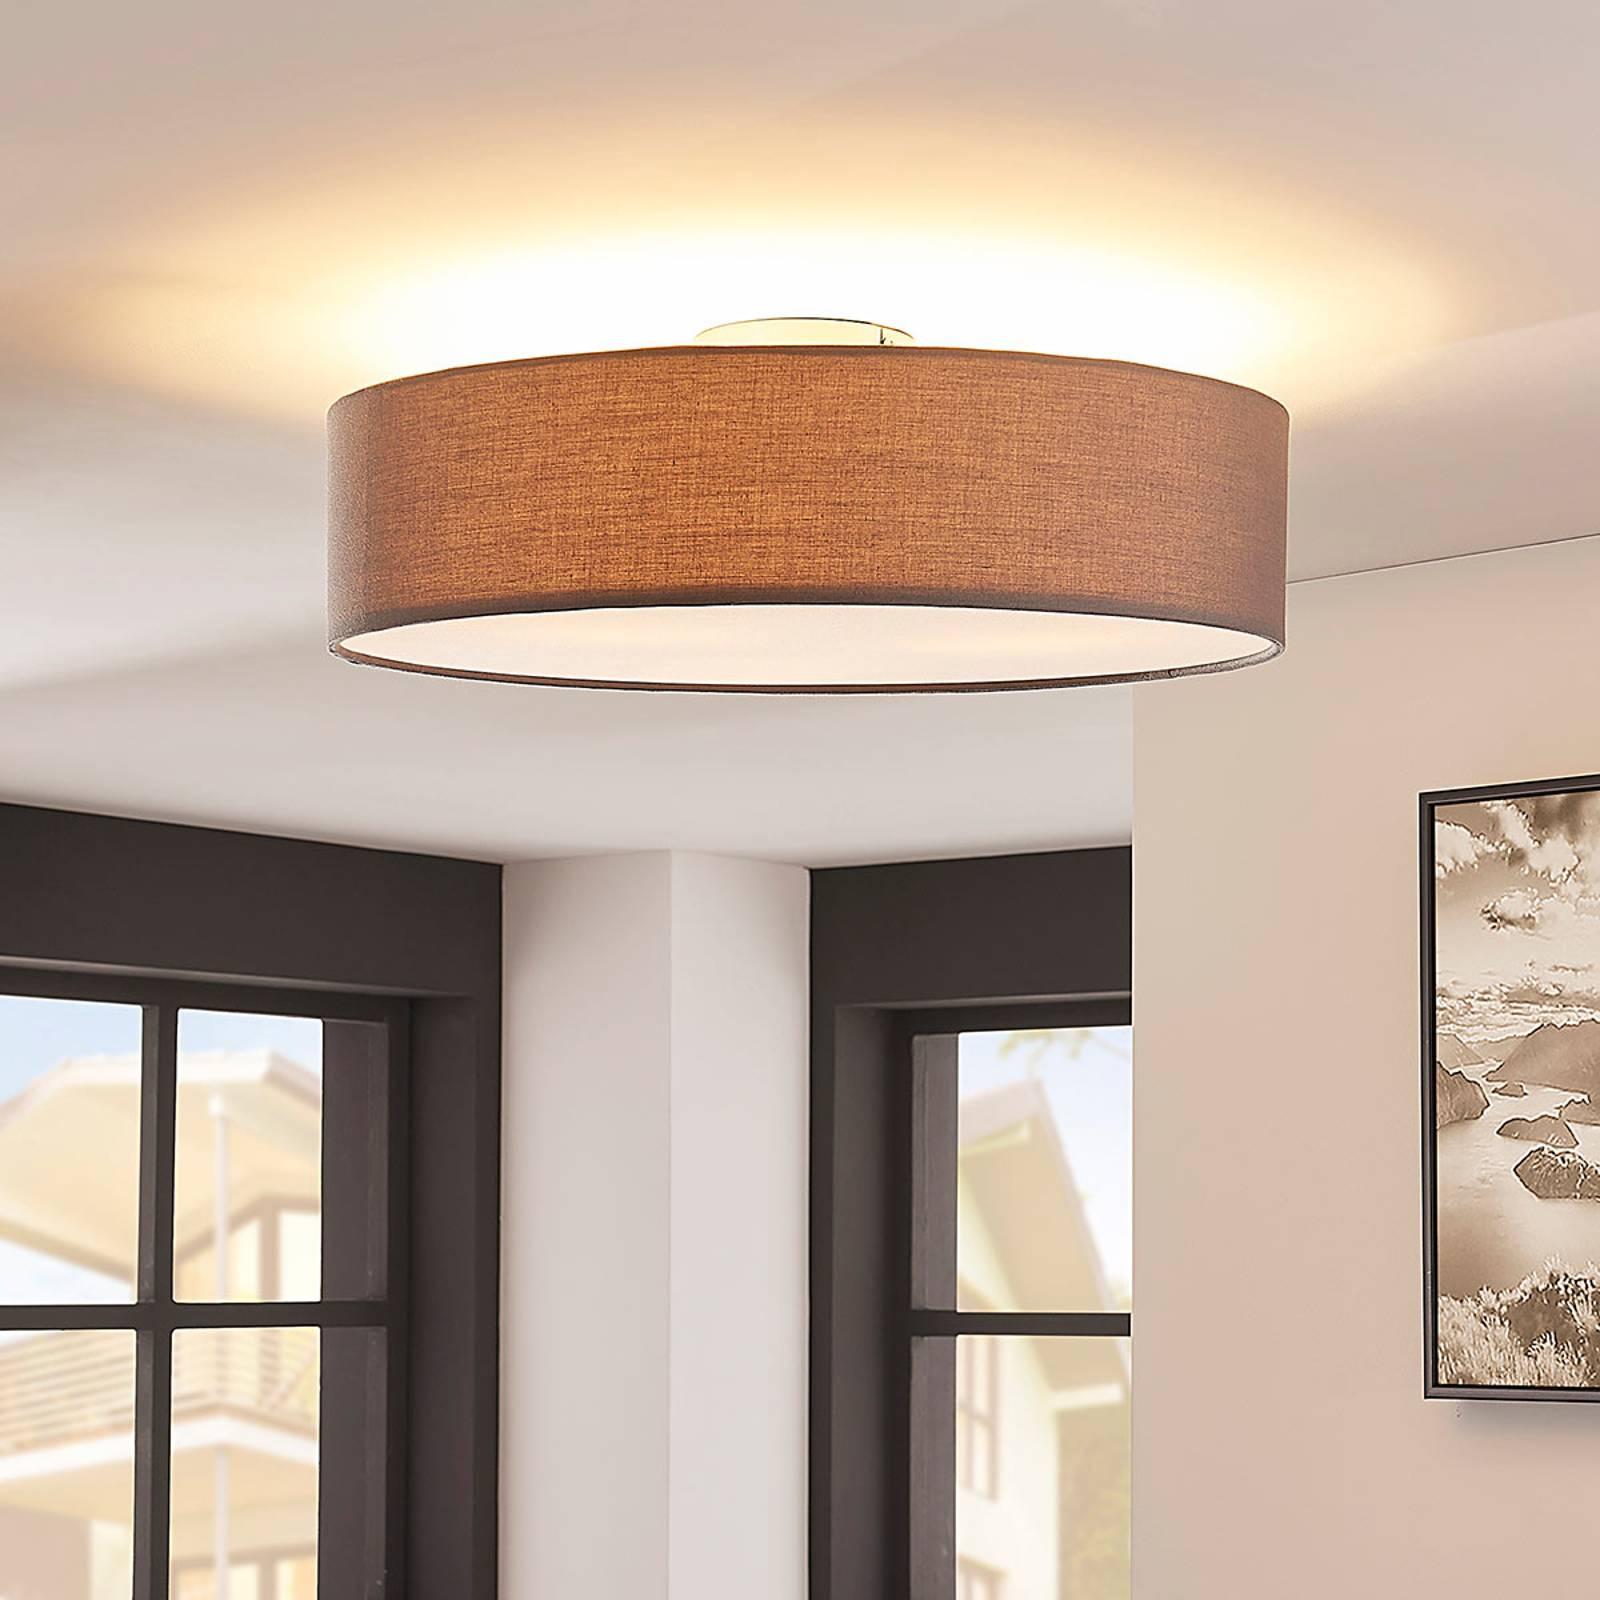 Szara lampa sufitowa LED SEBATIN z materiału